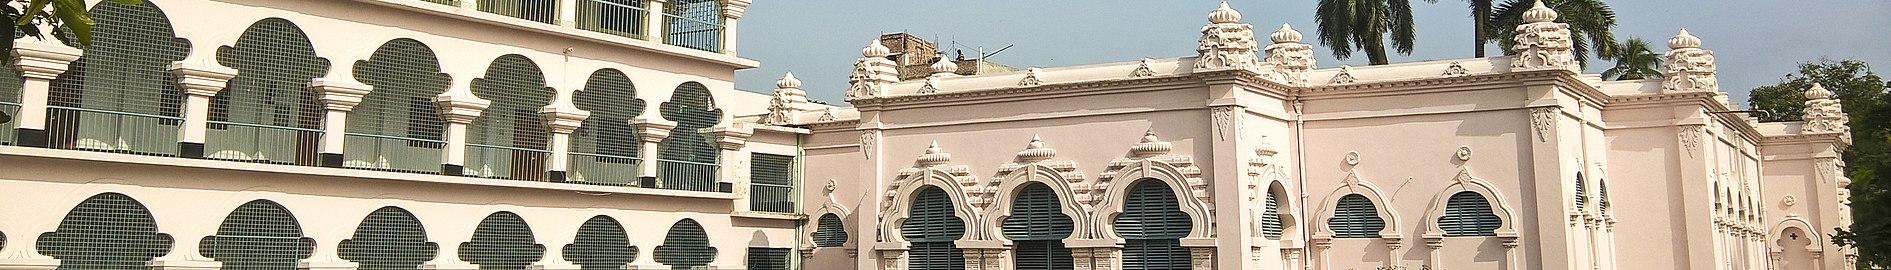 Varendra Research Museum (cropped).jpg